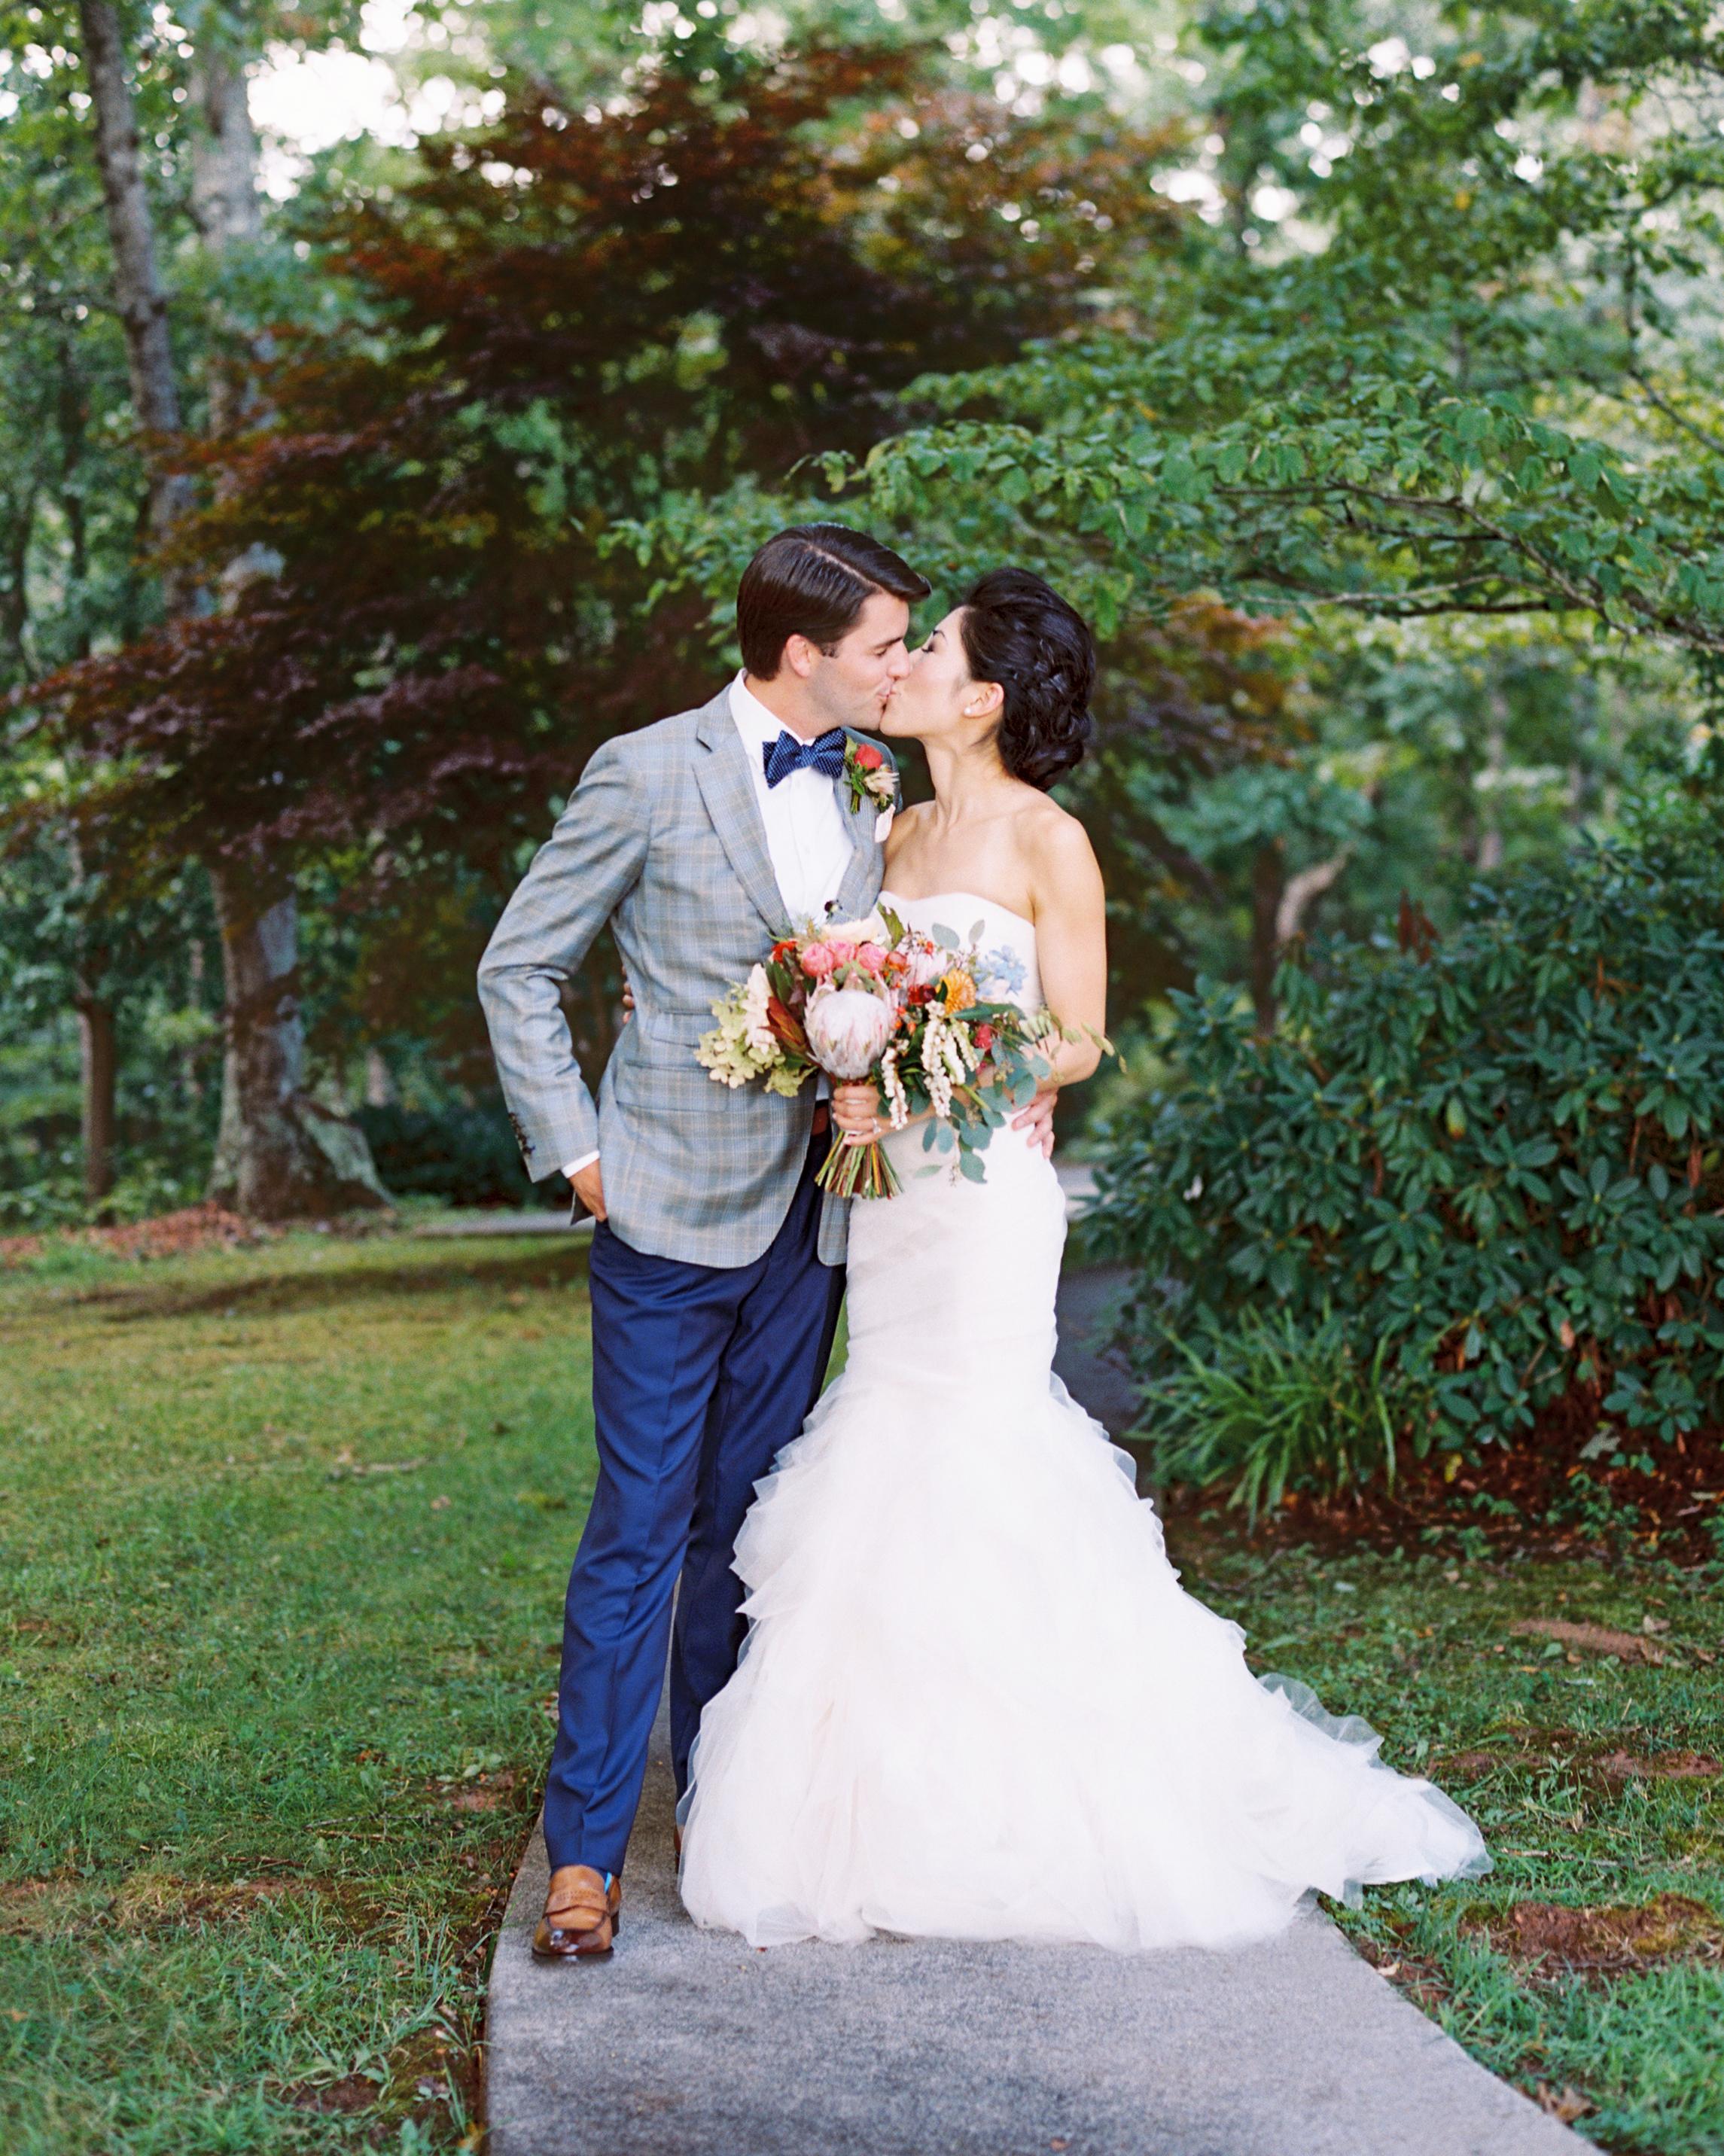 michelle-john-wedding-north-carolina-2-s111840-0215.jpg